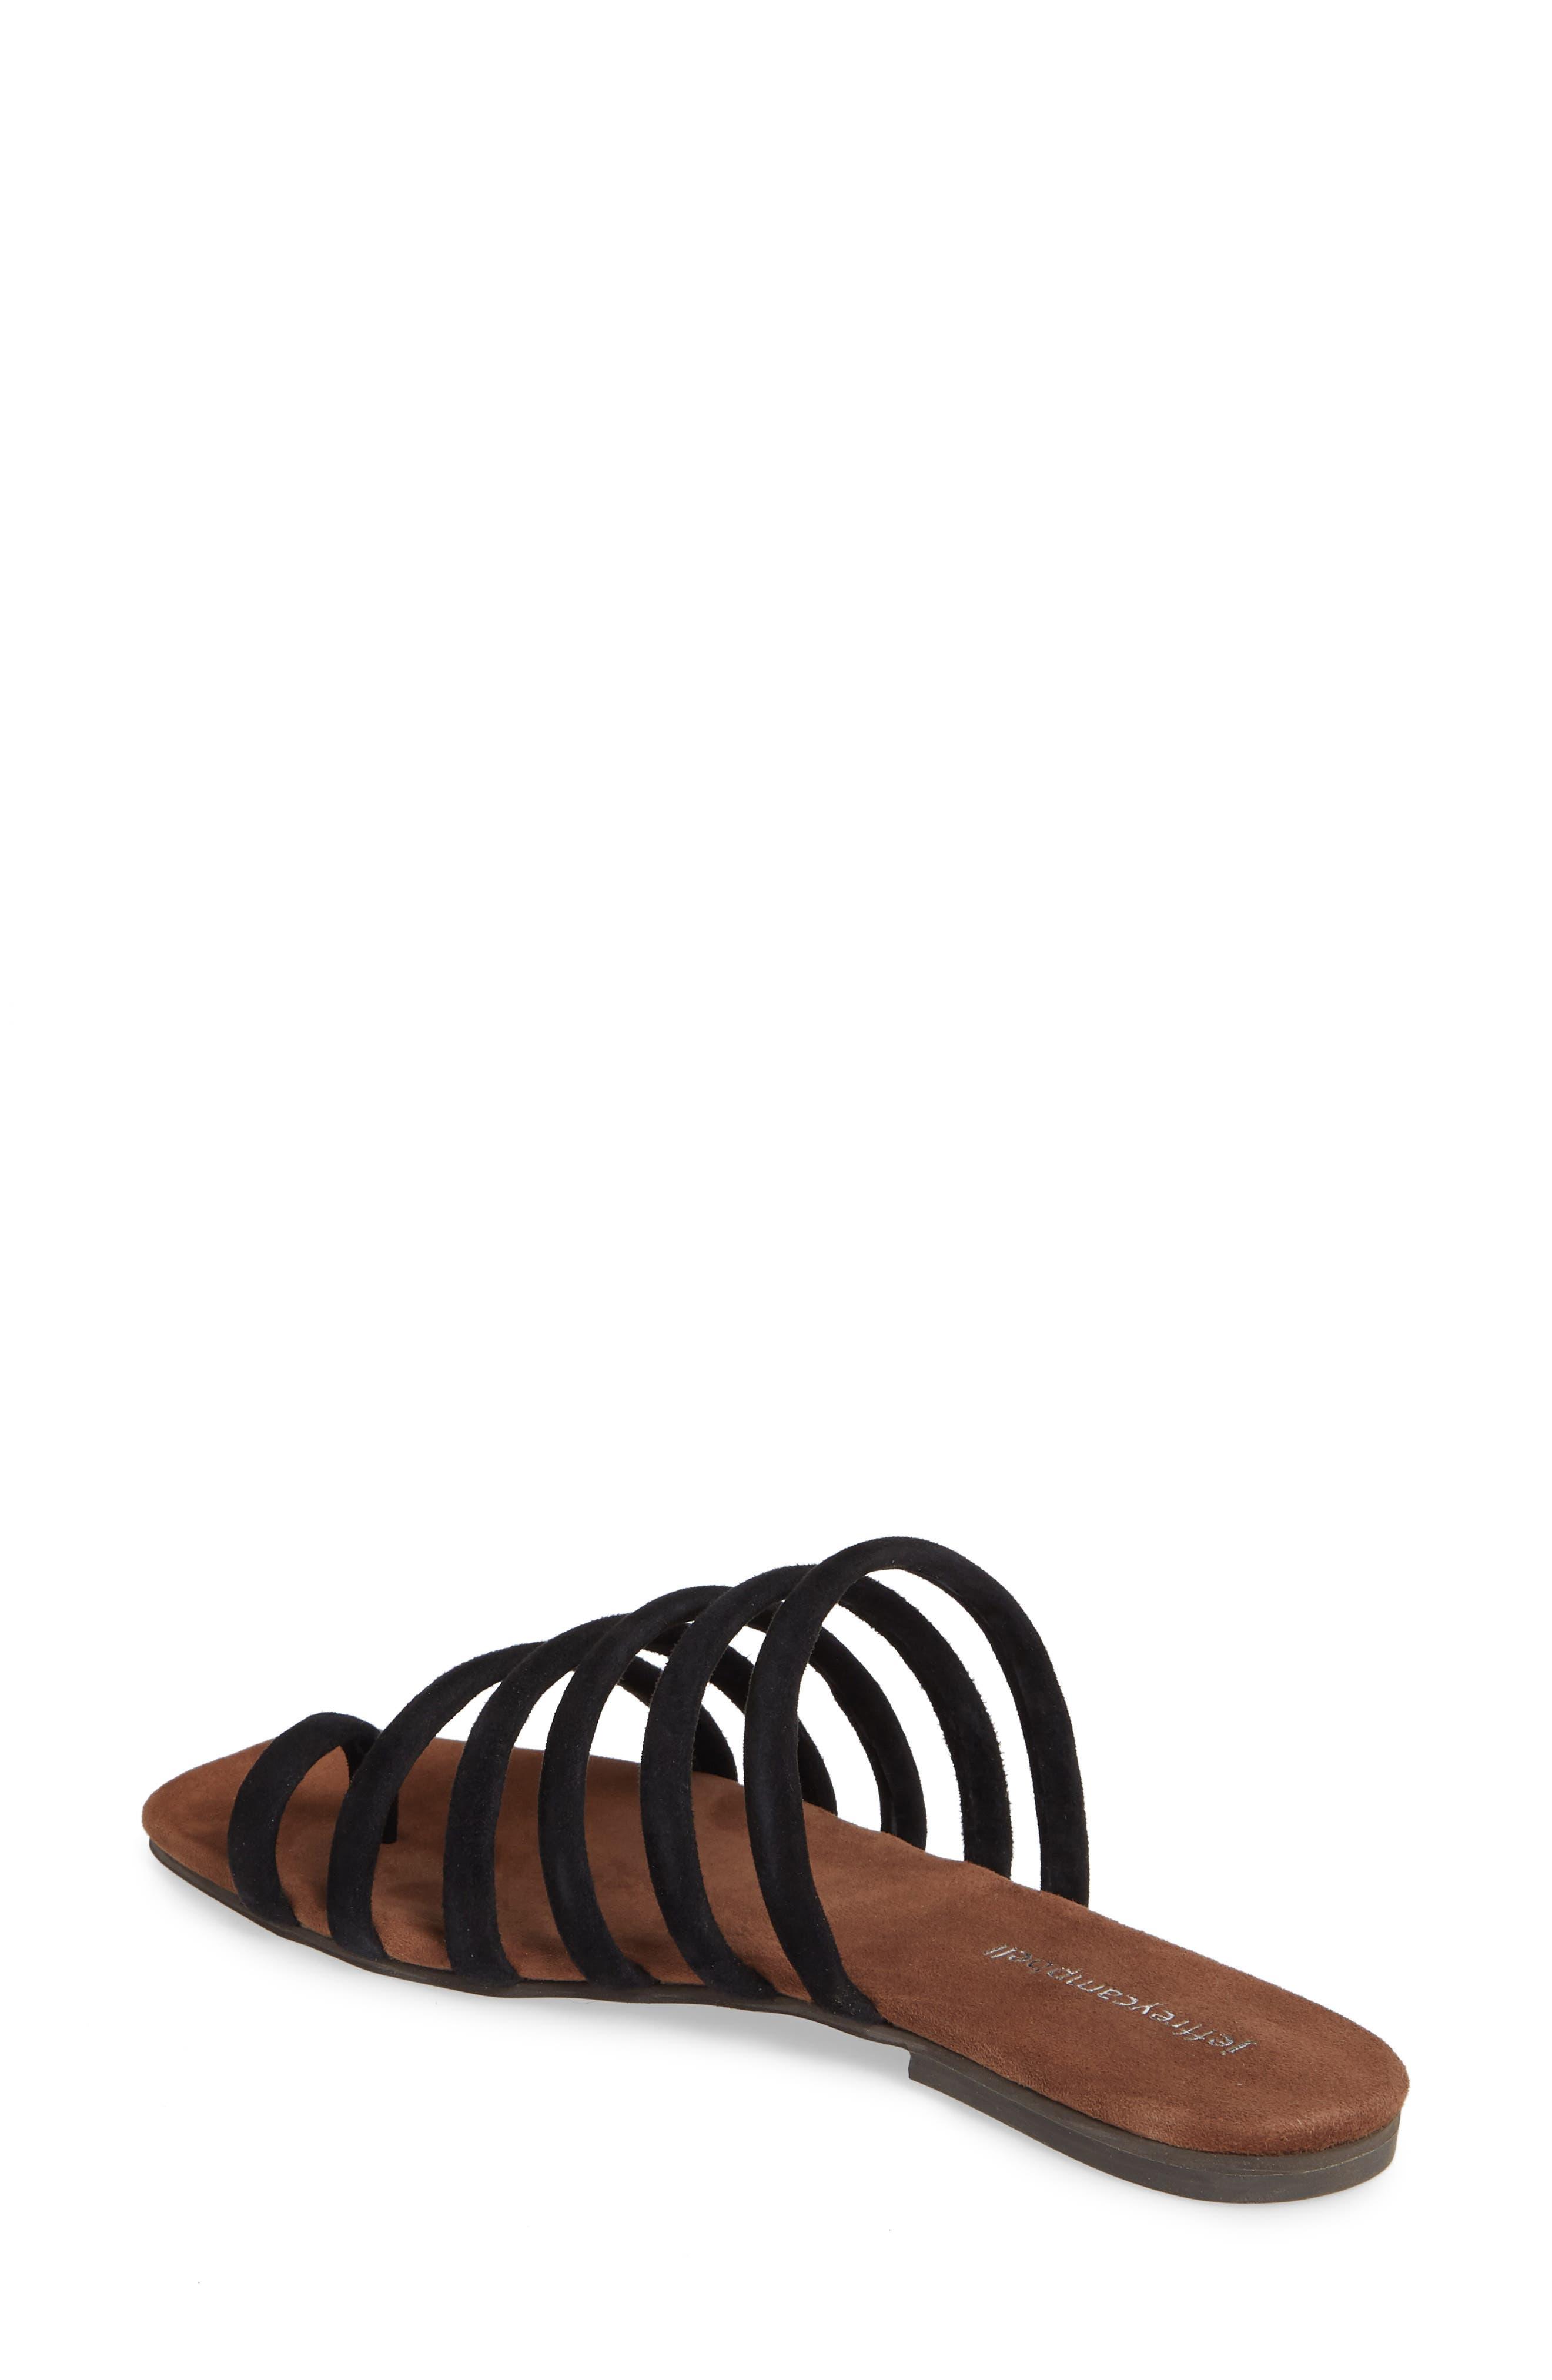 JEFFREY CAMPBELL, Coniper Slide Sandal, Alternate thumbnail 2, color, BLACK SUEDE